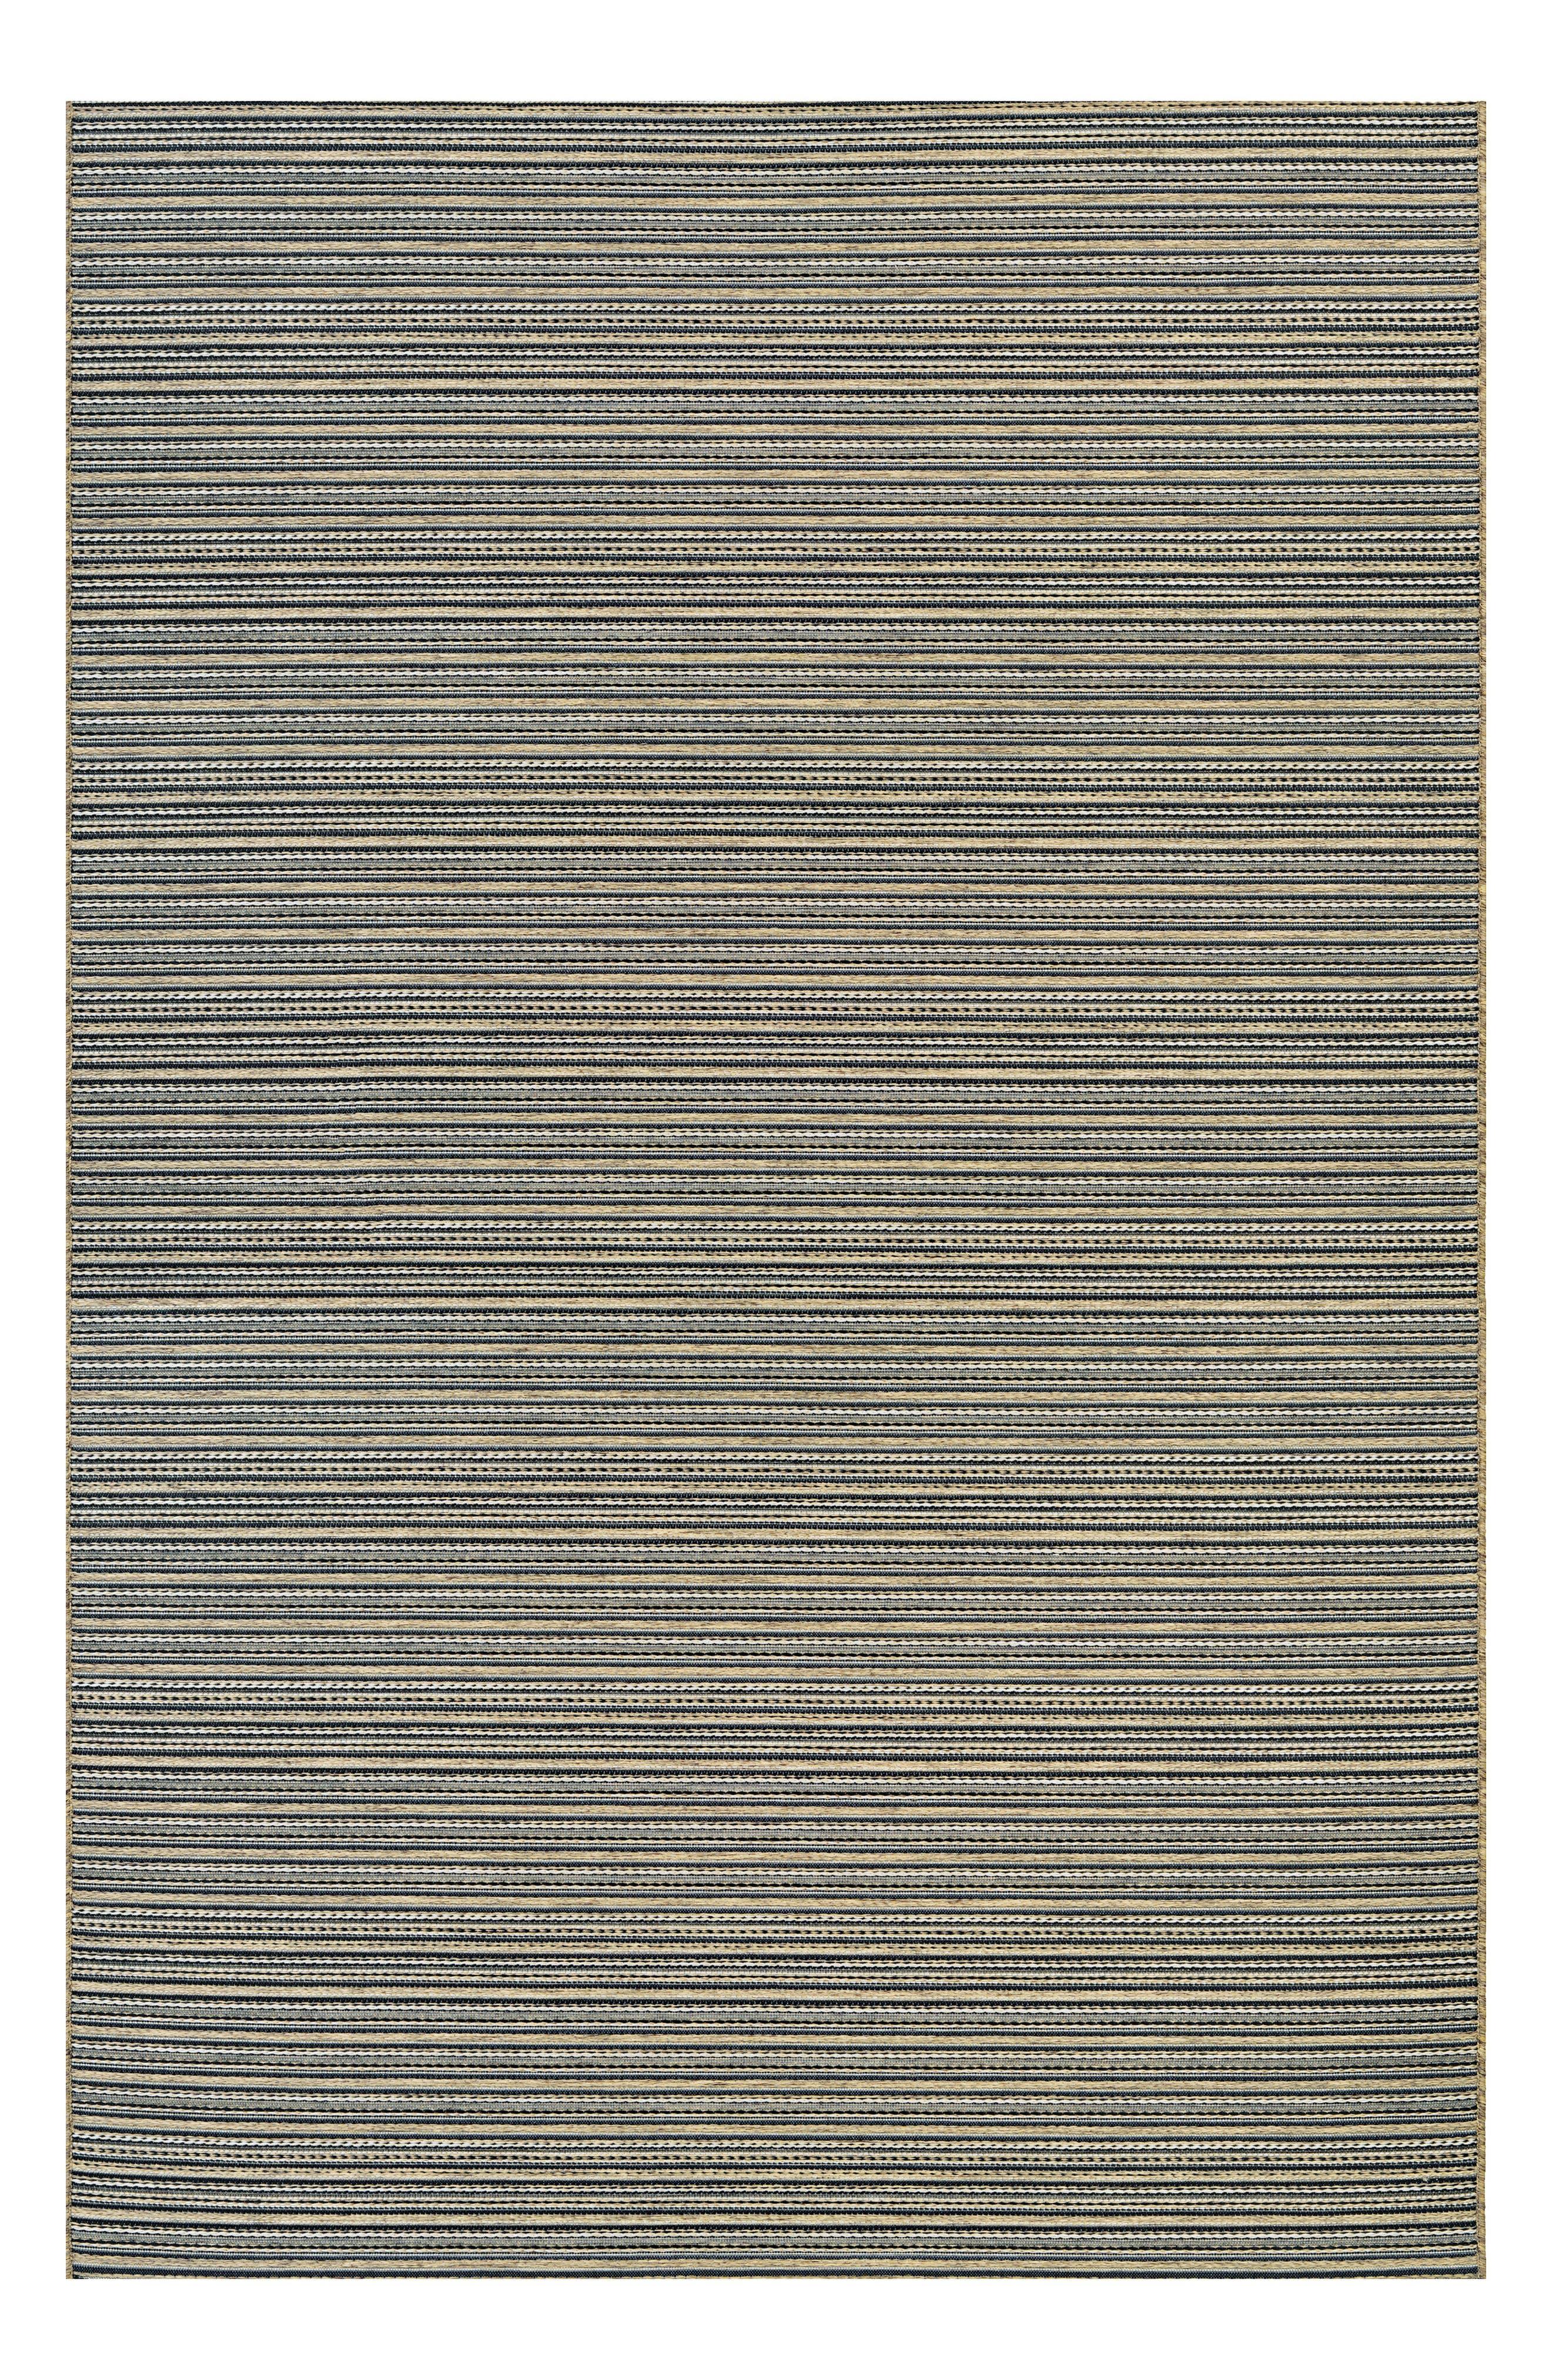 Harwich Indoor/Outdoor Rug,                             Main thumbnail 1, color,                             001